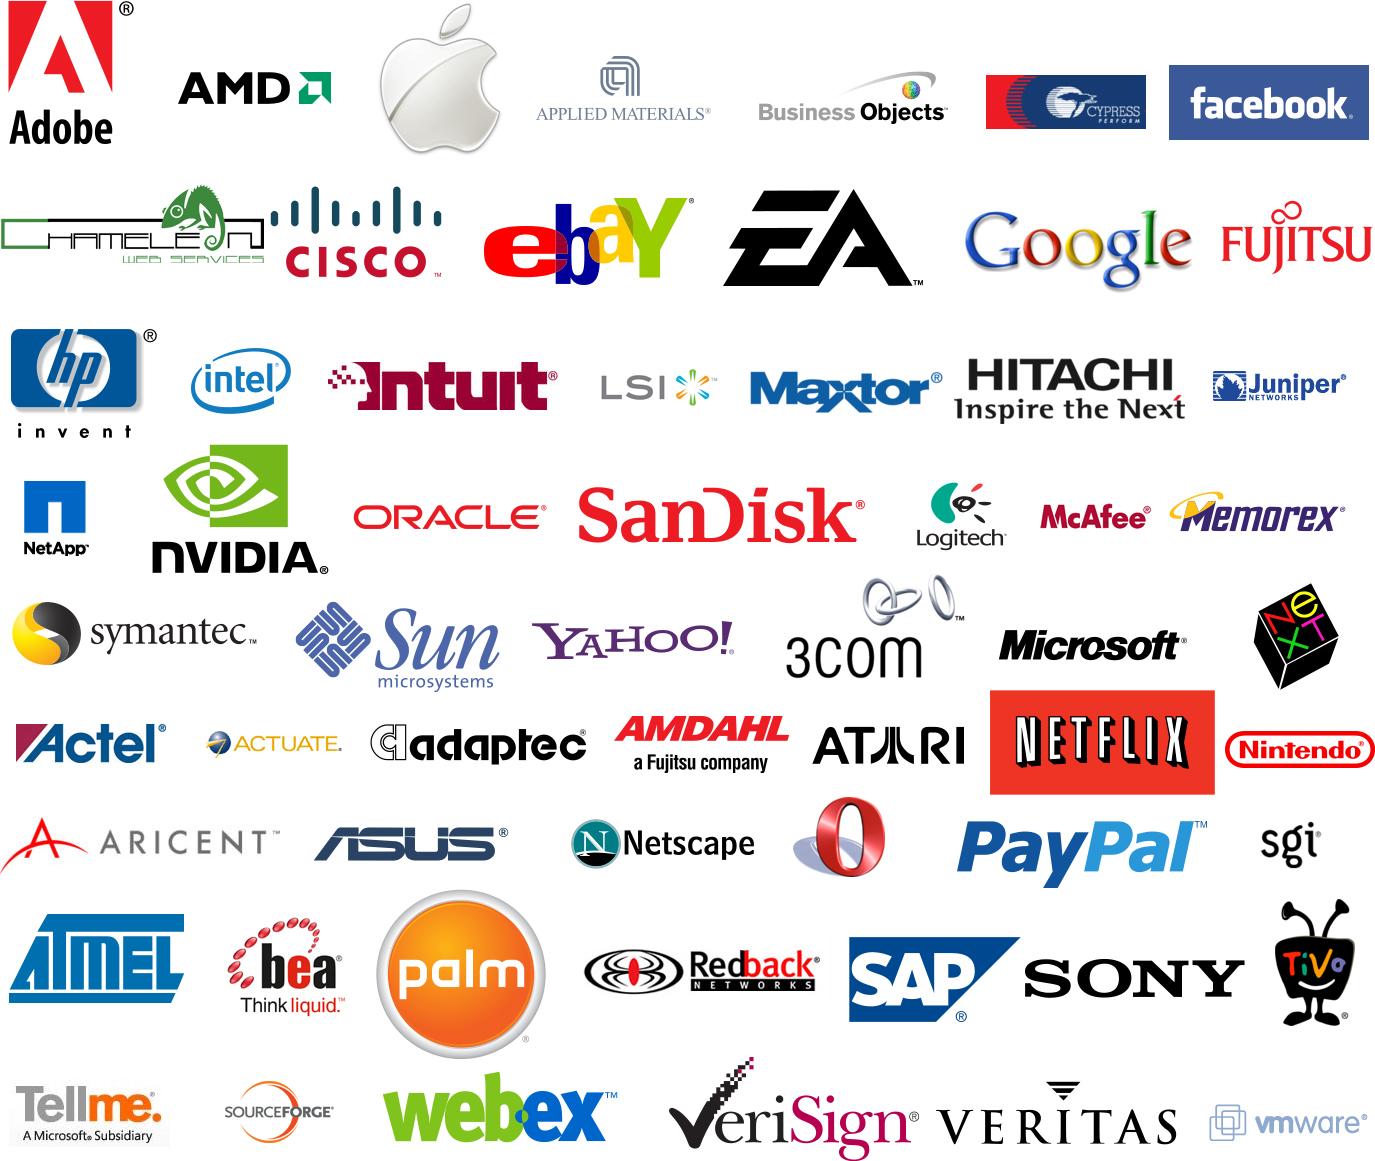 Branding seo chameleon web services Branding and logo design companies